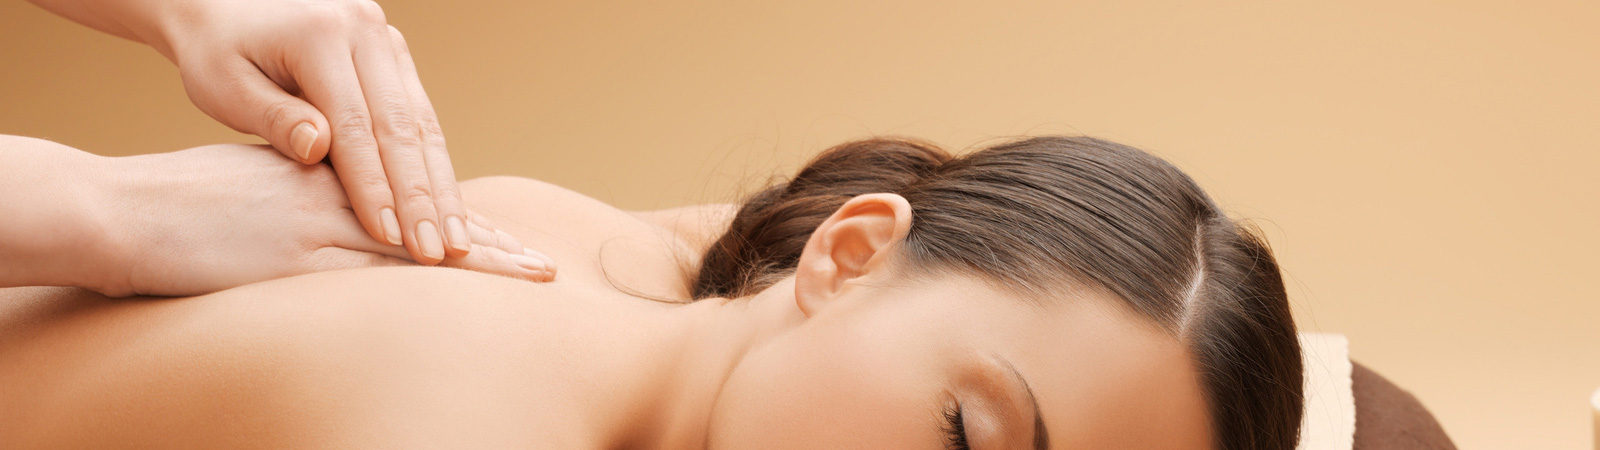 Rückenmassage Physiofit Zeitz